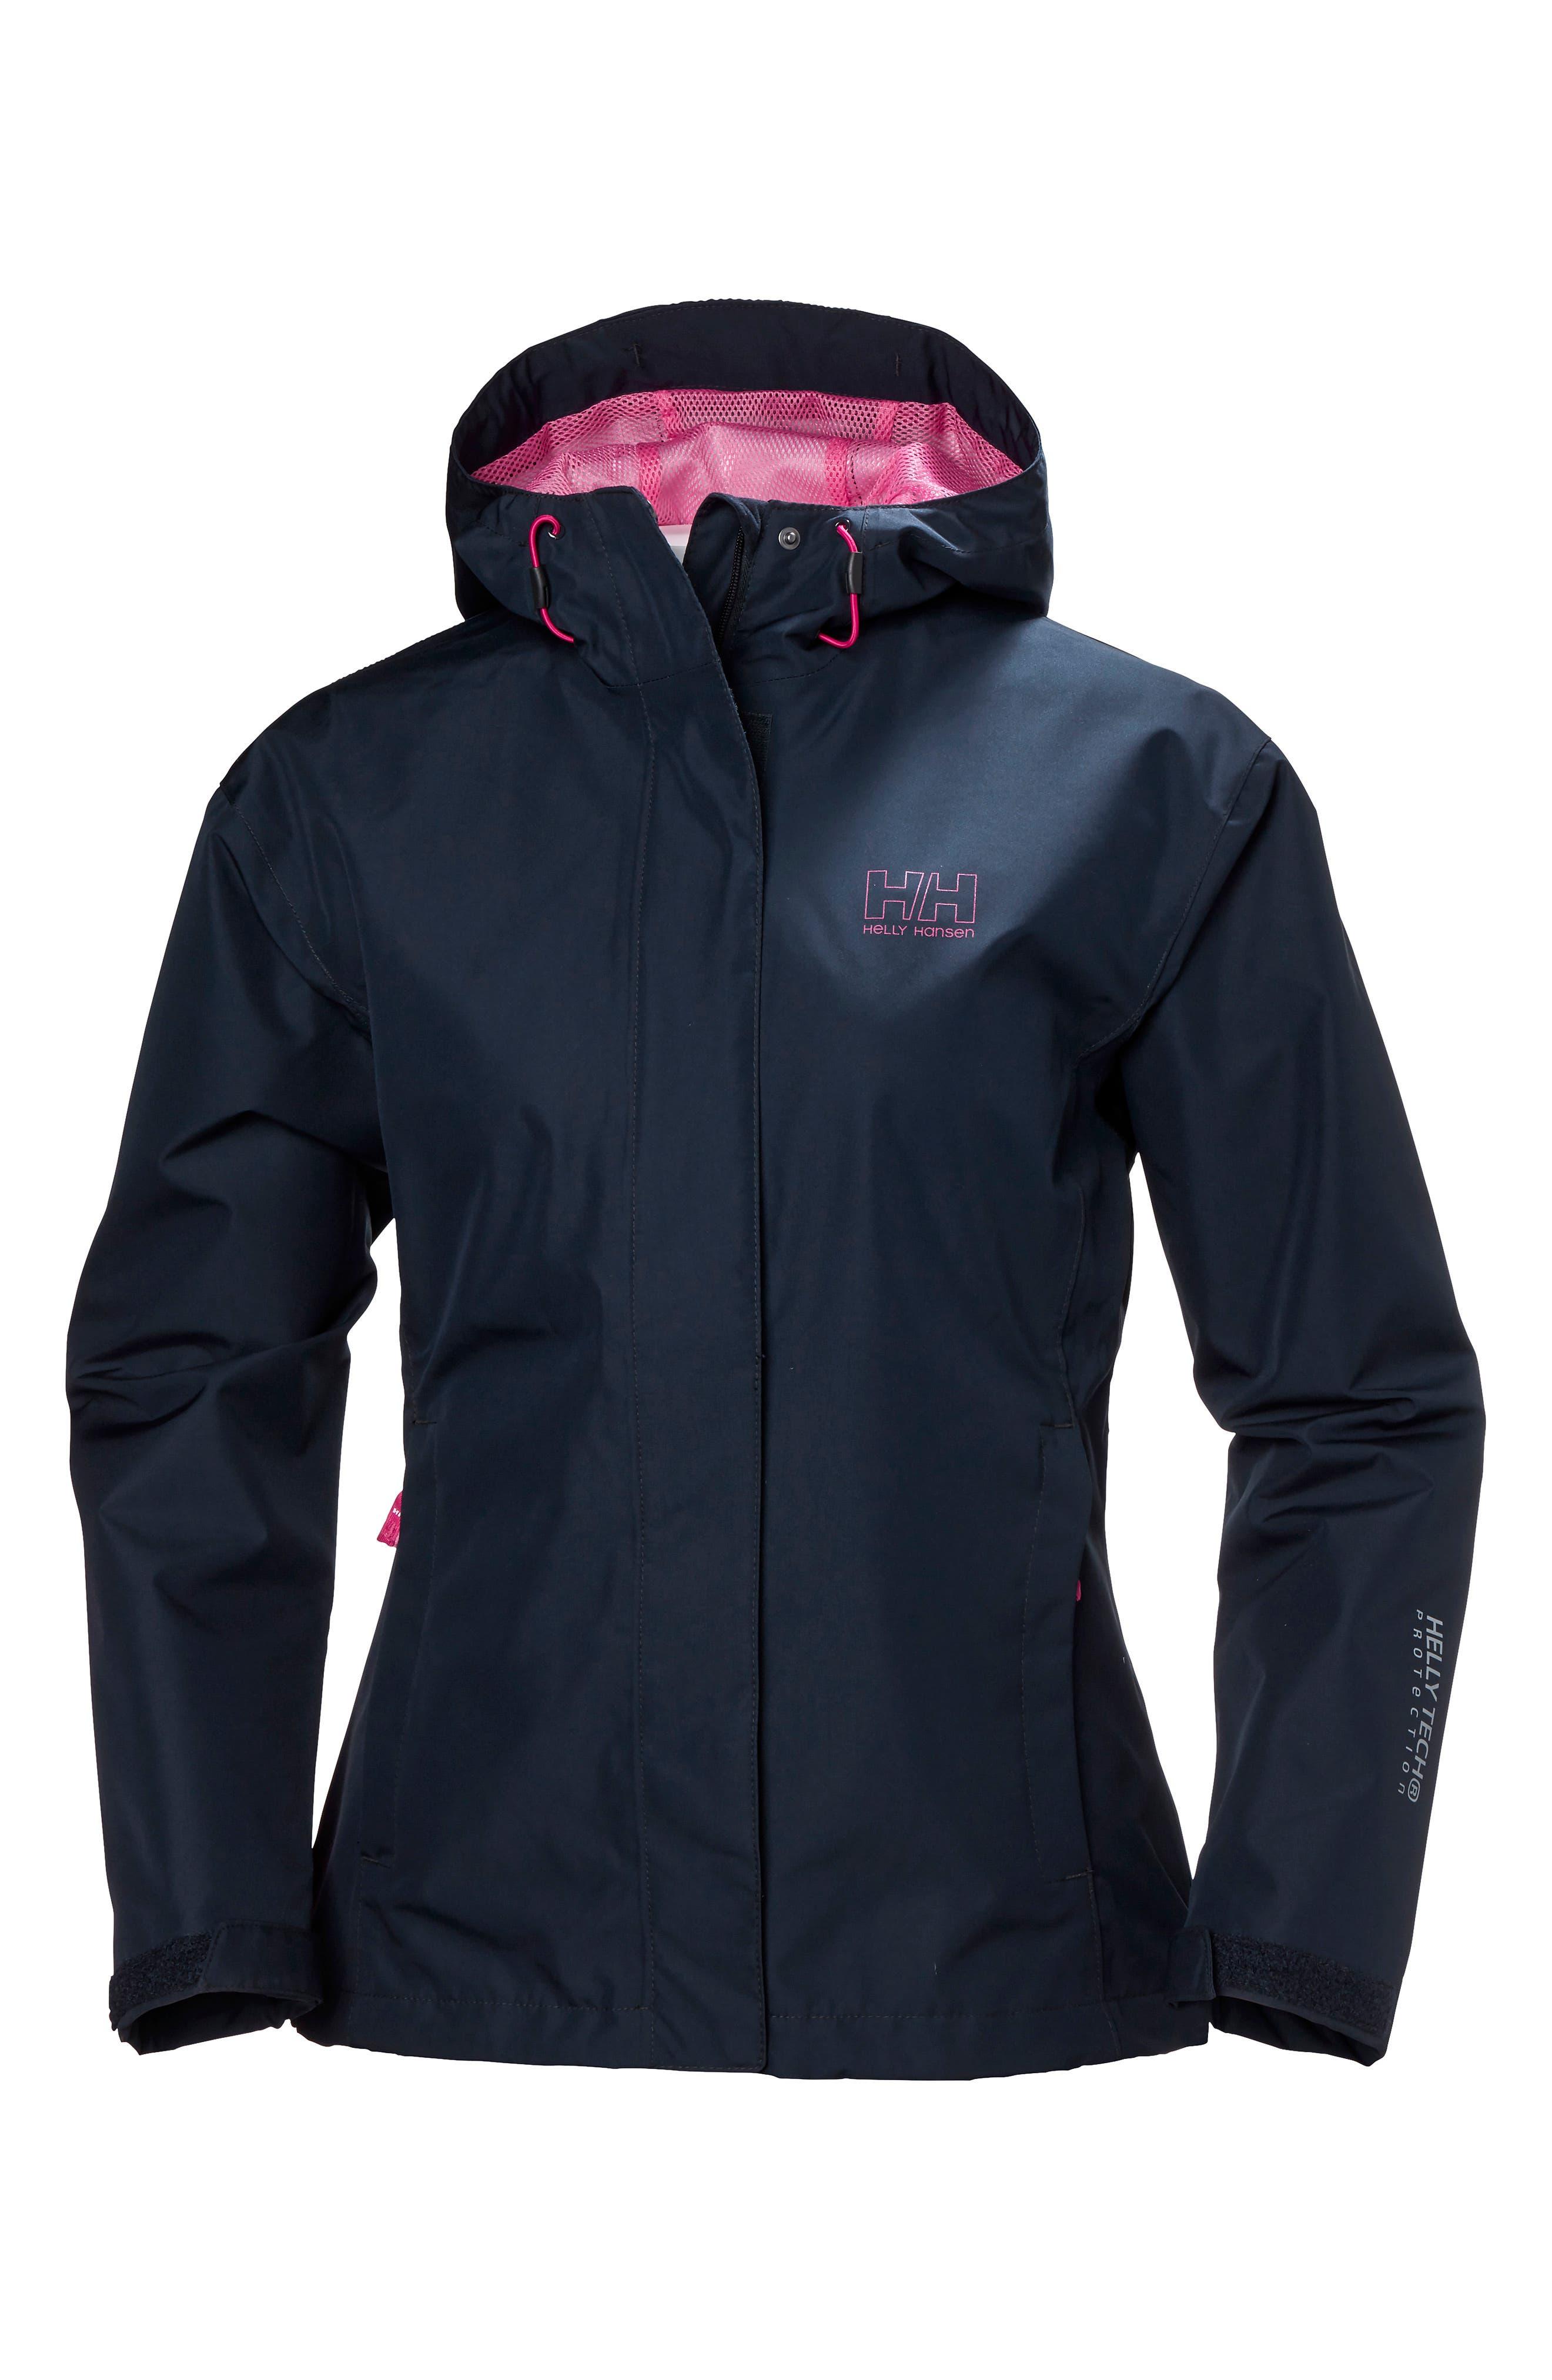 'Seven' Rain Jacket